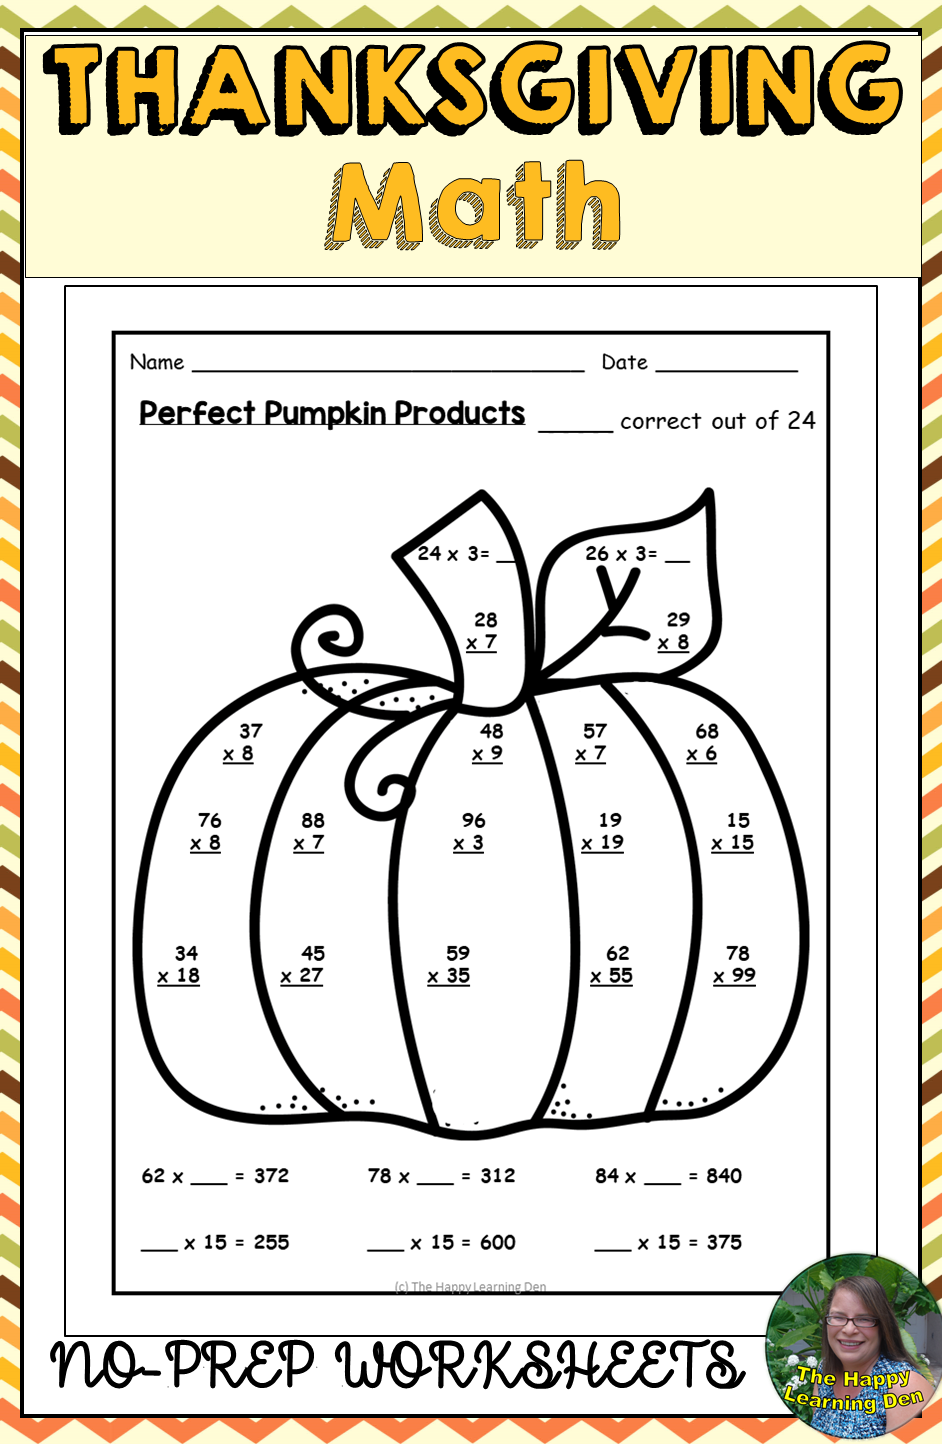 Thanksgiving Math Worksheets Activities   Thanksgiving math worksheets [ 1444 x 942 Pixel ]